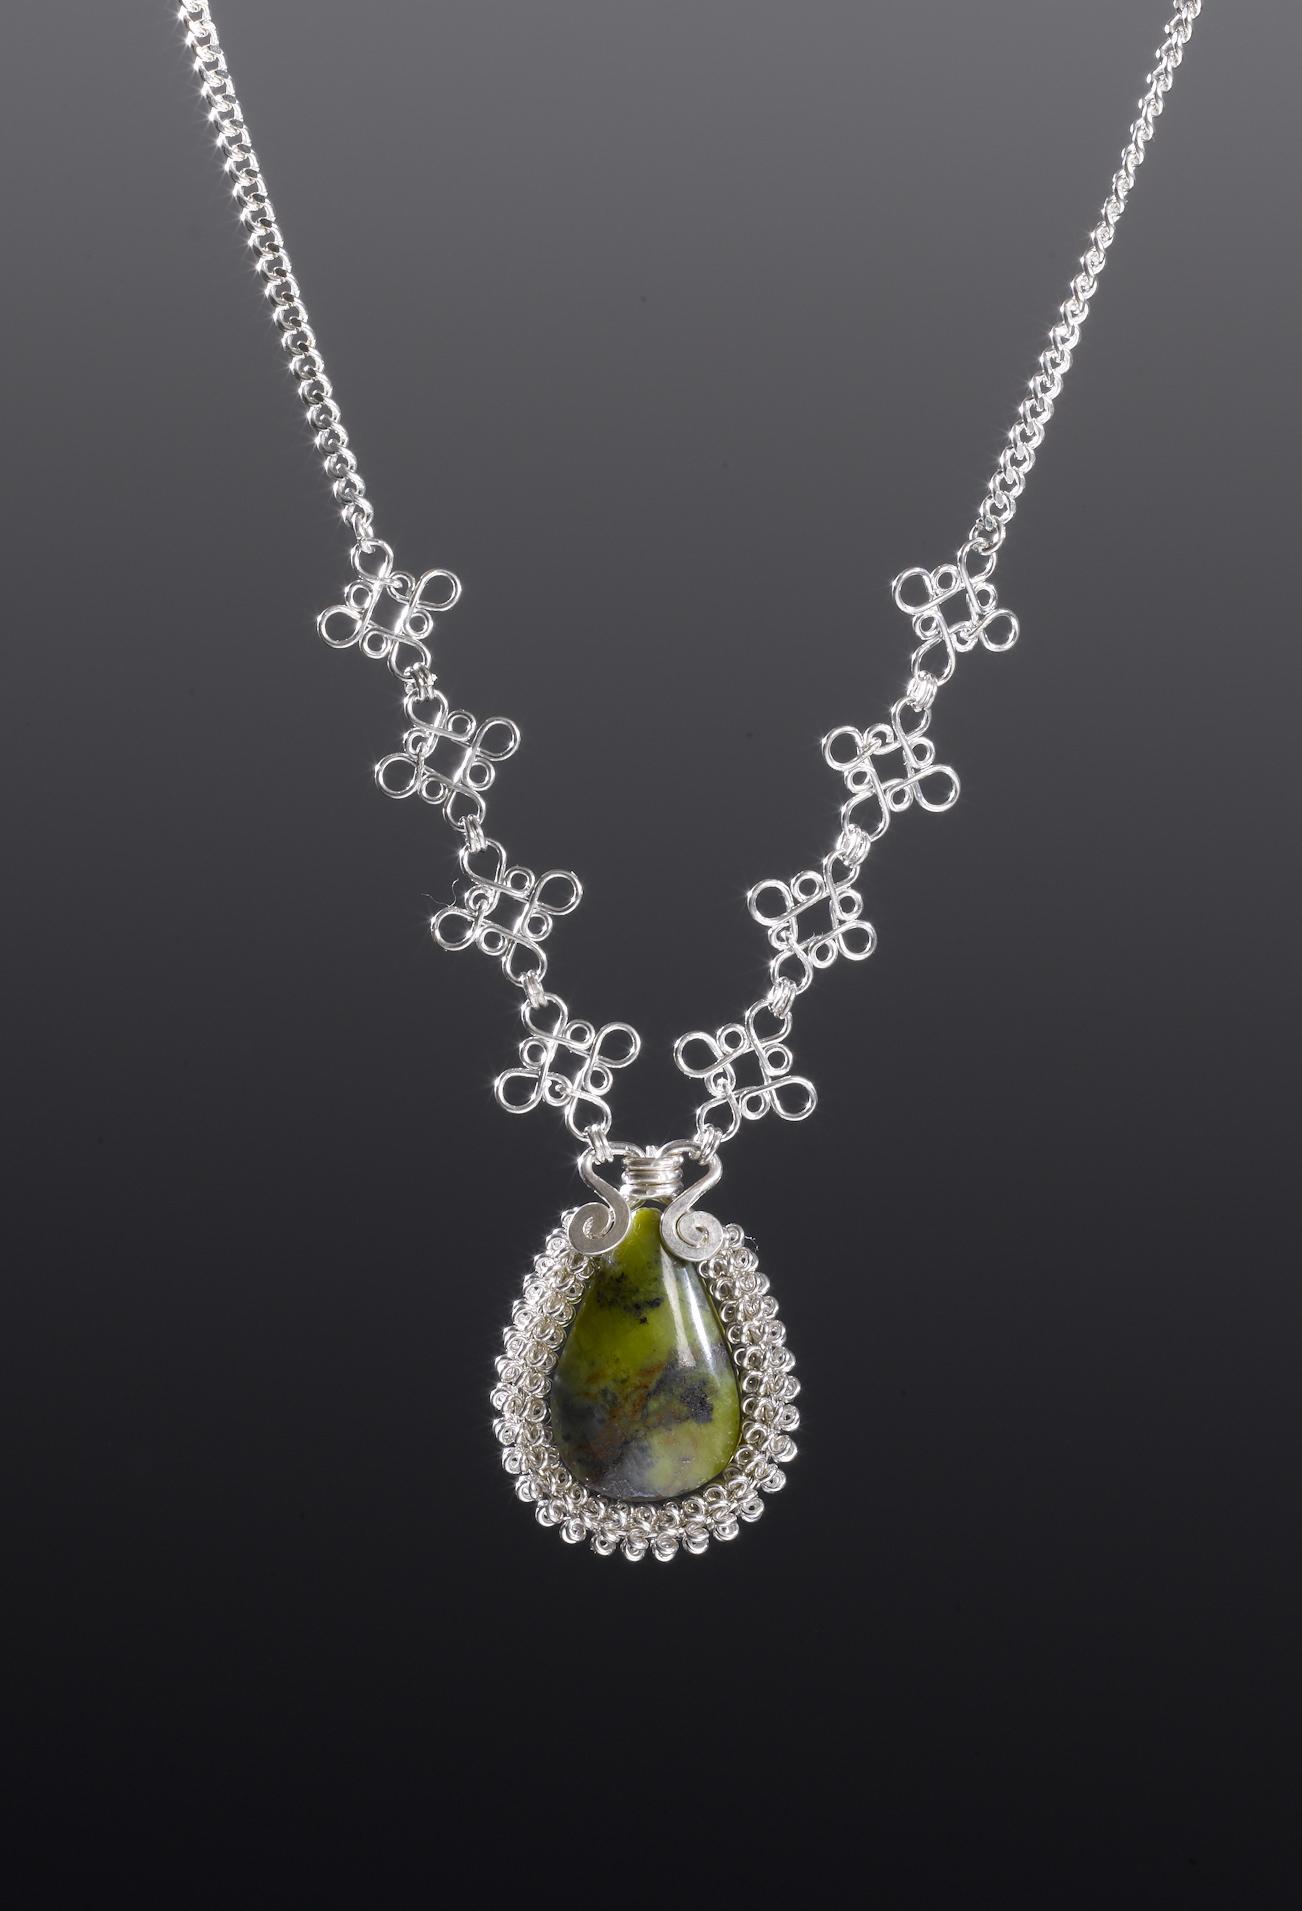 macchu silver necklace by designer coco paniora salinas